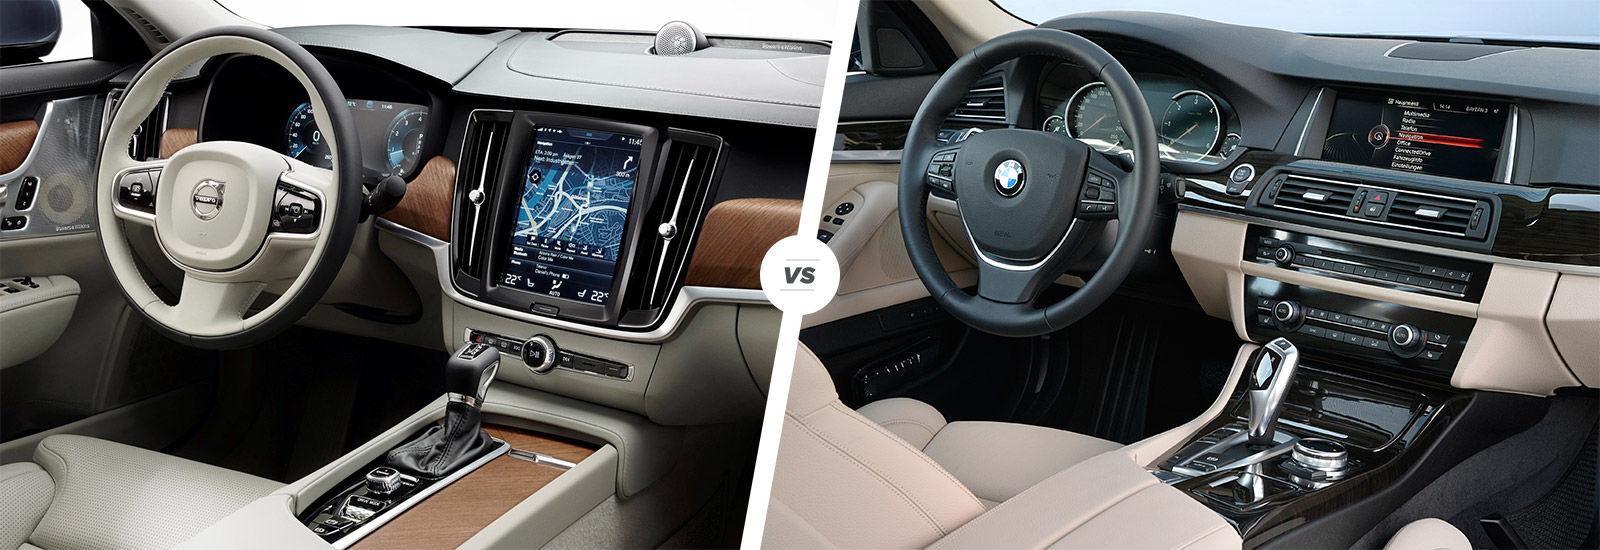 Volvo S90 vs BMW 5 Series sidebyside comparison  carwow